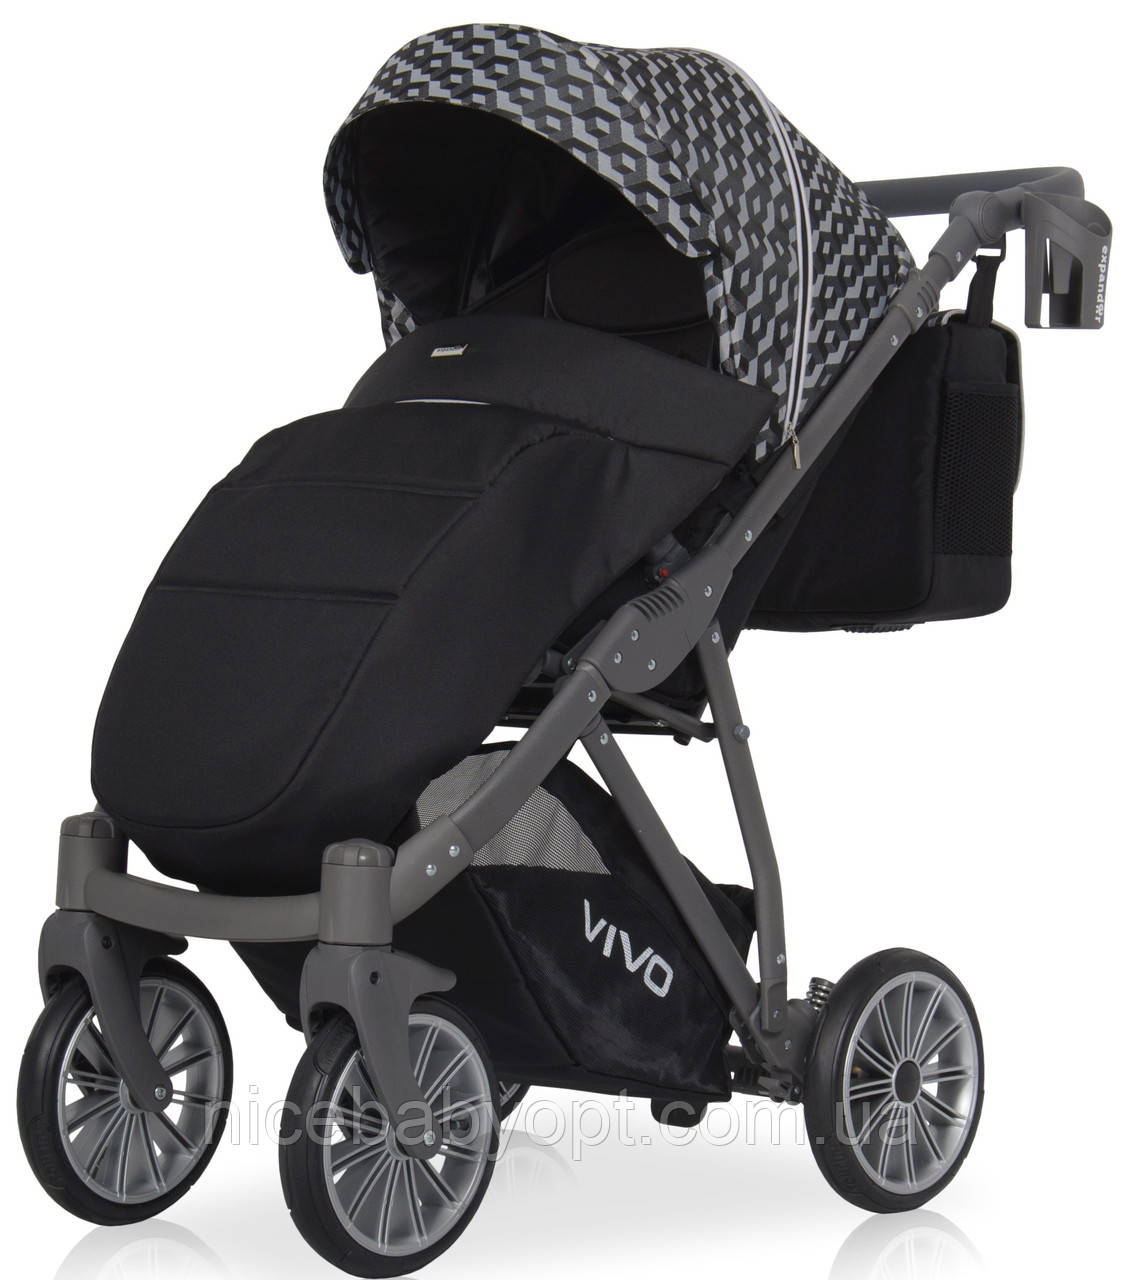 Прогулянкова коляска Expander Vivo 01 Carbon